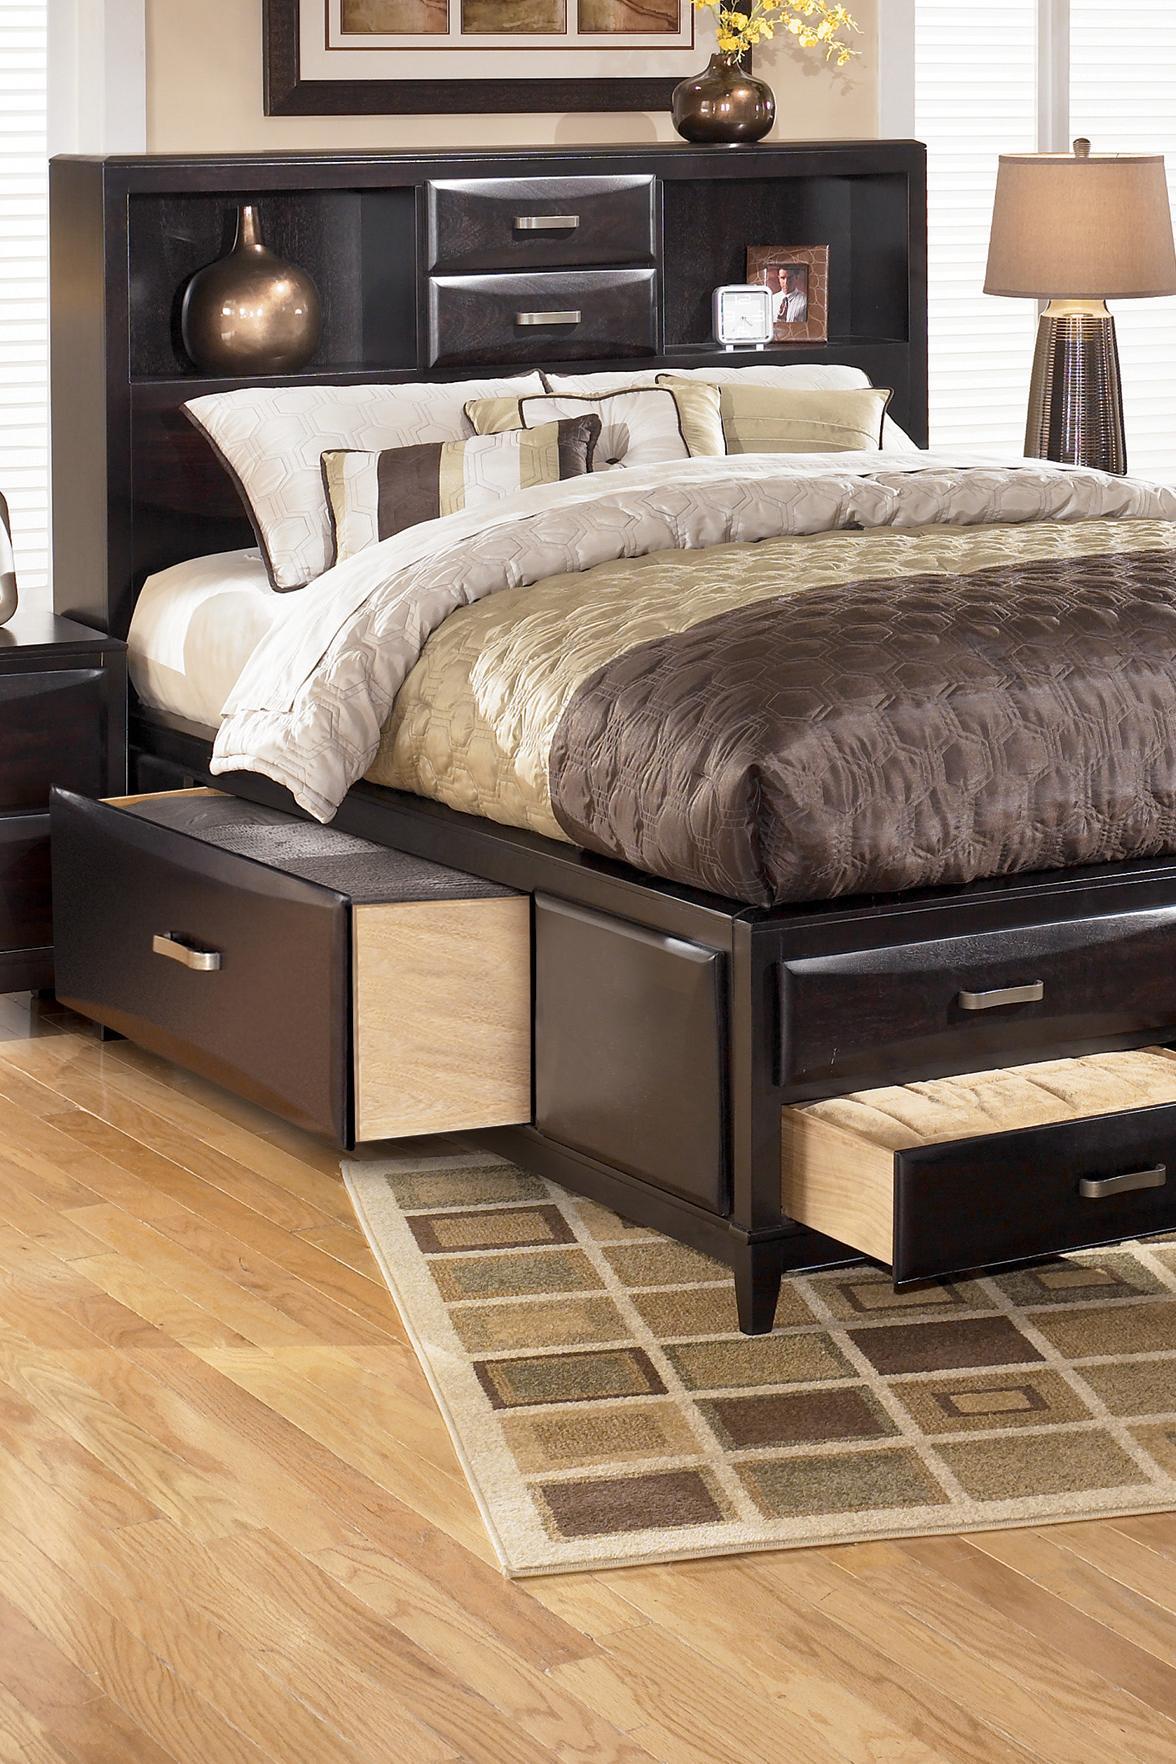 ashley furniture kira queen storage bed sparks homestore u0026 home furnishings direct beds thatcher cottonwood safford sedona morenci